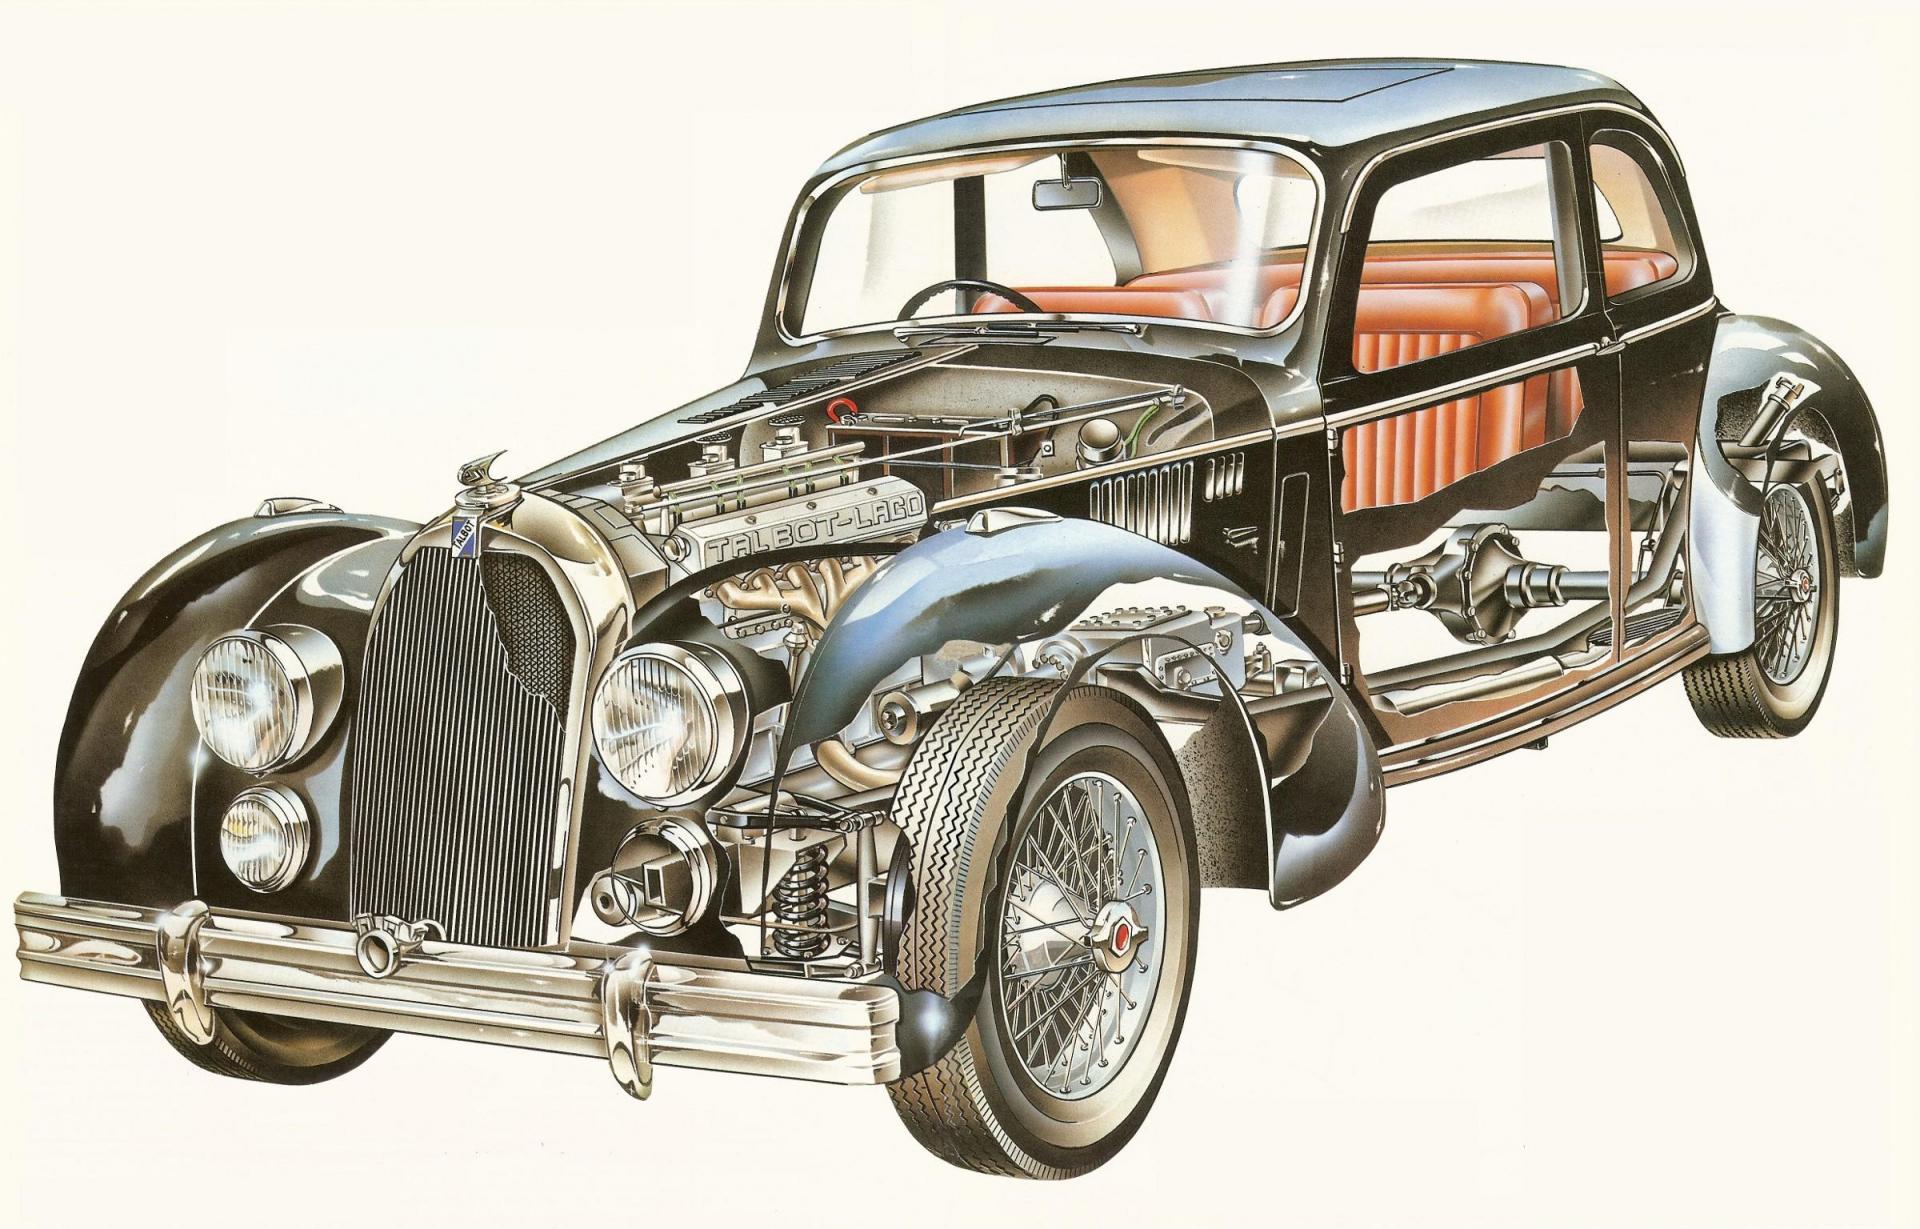 Talbot-Lago-T26-Record-Cabriolet-by-Antem_024.thumb.jpg.cb3206314626ccd93f2472b8d602d472.jpg